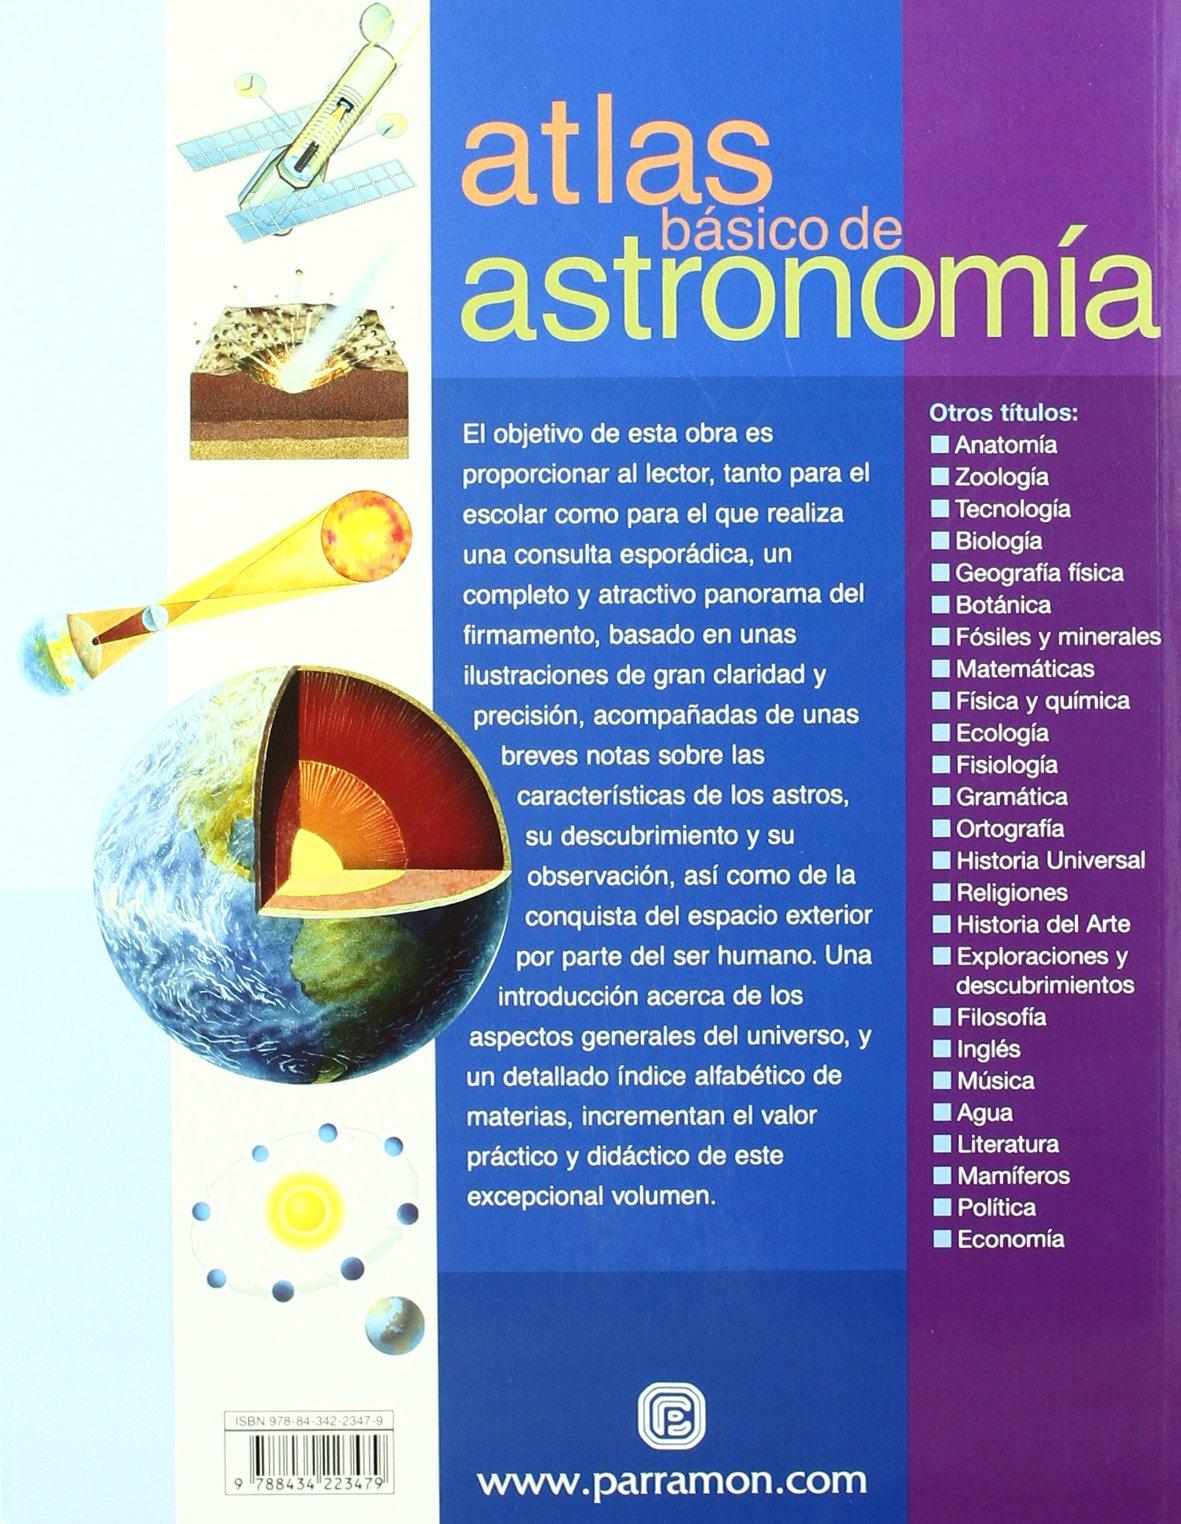 Atlas de astronomia/Atlas of astronomy (Atlas Basico de) (Spanish Edition)